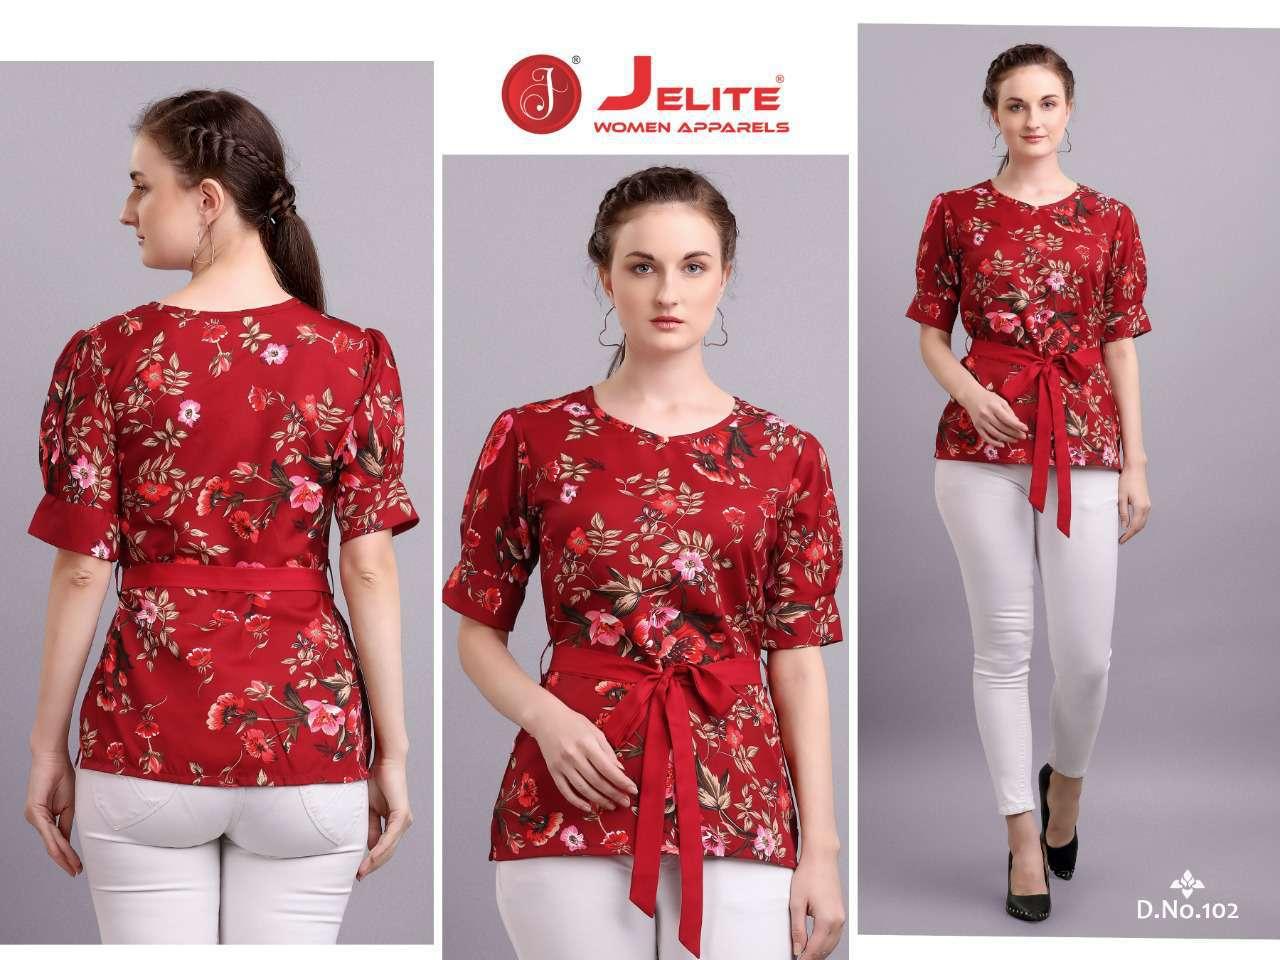 Jelite Tulip Tops Wholesale Catalog 8 Pcs 2 - Jelite Tulip Tops Wholesale Catalog 8 Pcs